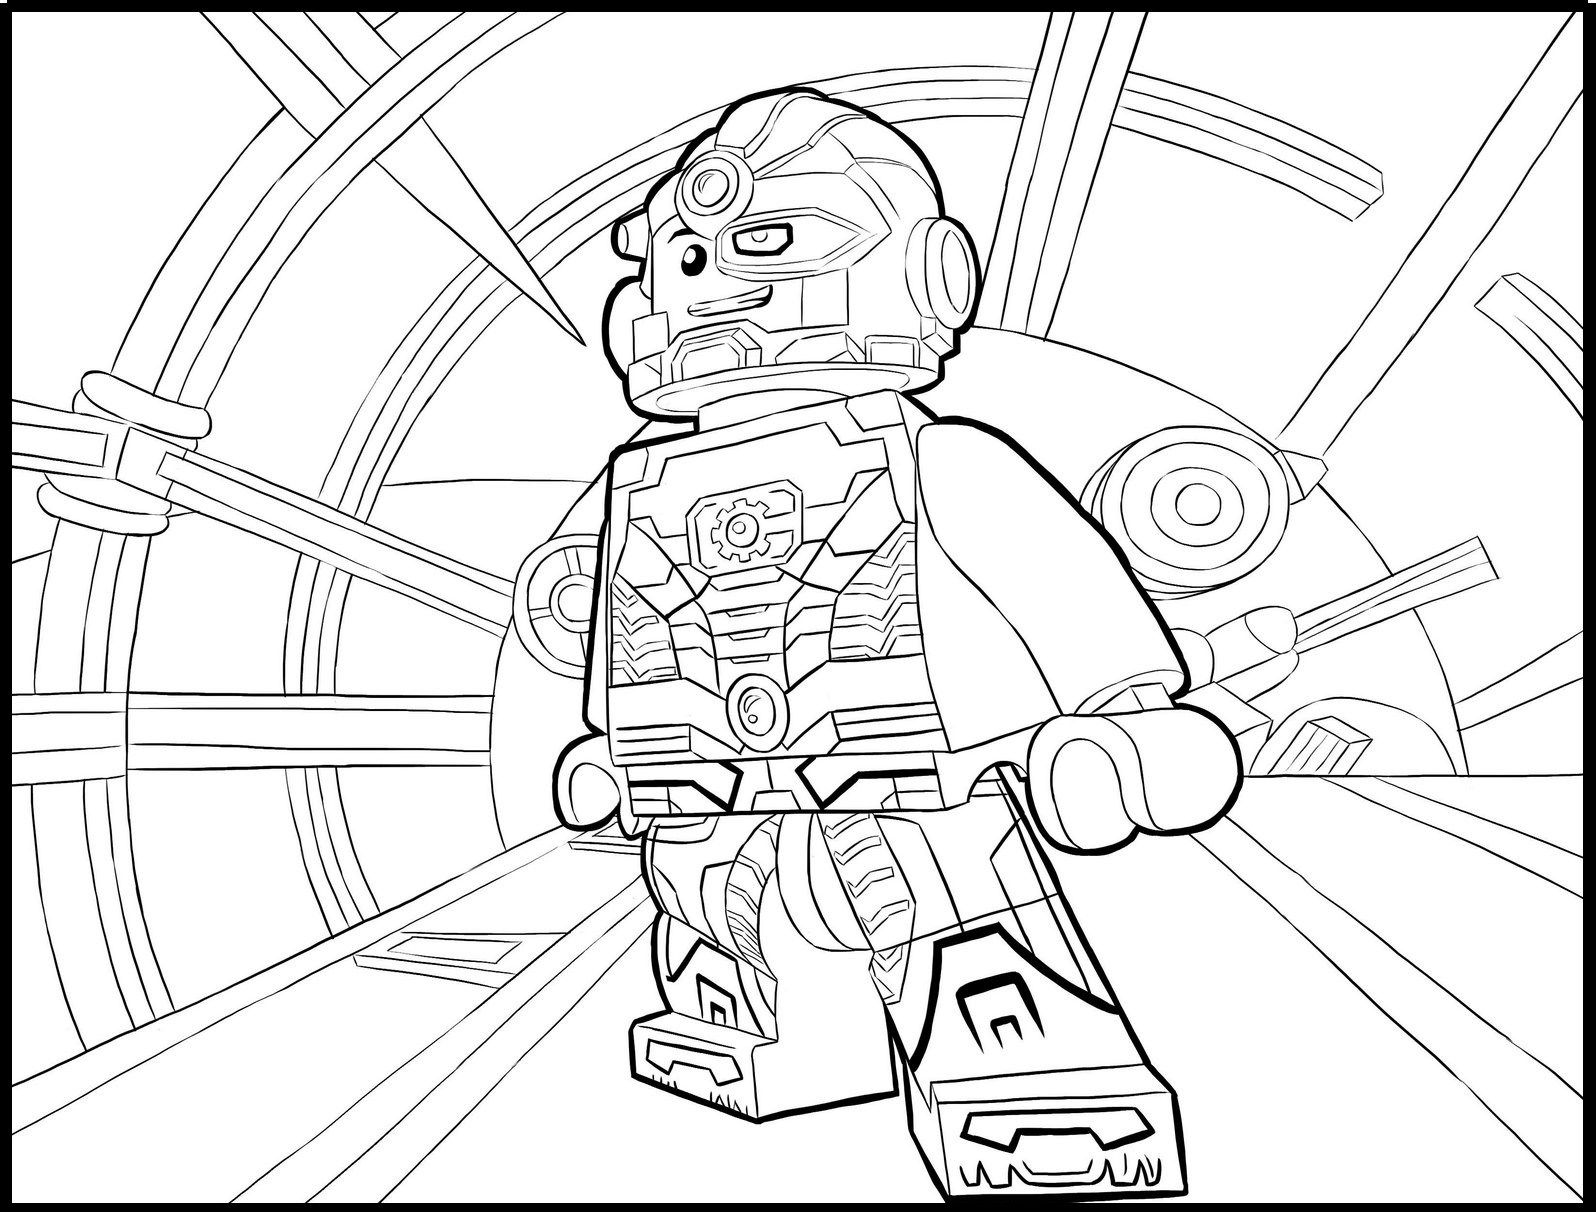 Lego Cyborg Coloring Sheet | DC Comics Coloring Pages | Pinterest